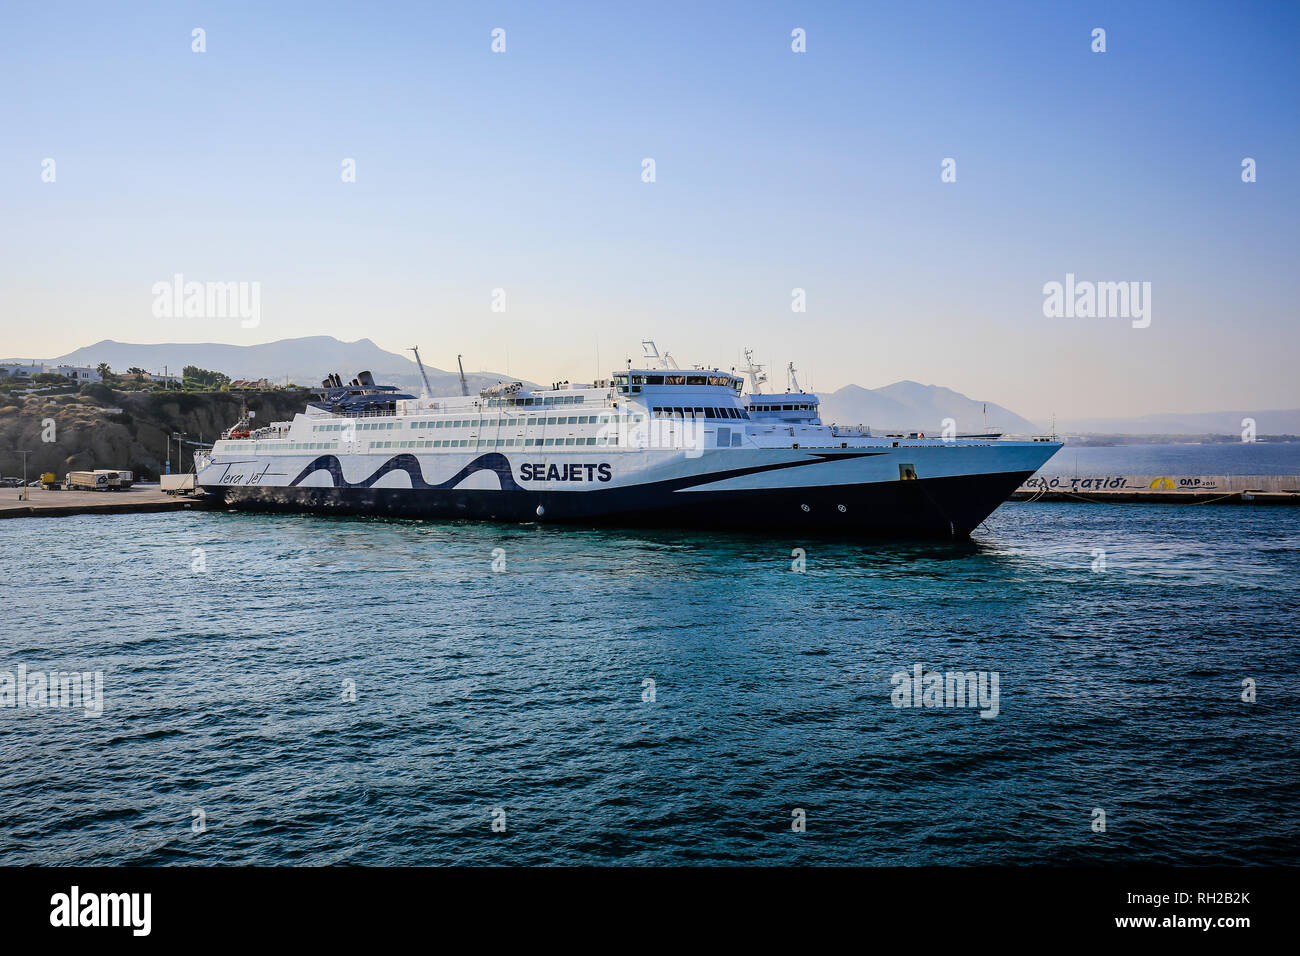 Rafina, Attica, Greece - Ferry of the Seajets line runs from the port of Rafina to the Cyclades Islands.  Rafina, Attika, Griechenland - Faehre der Li - Stock Image